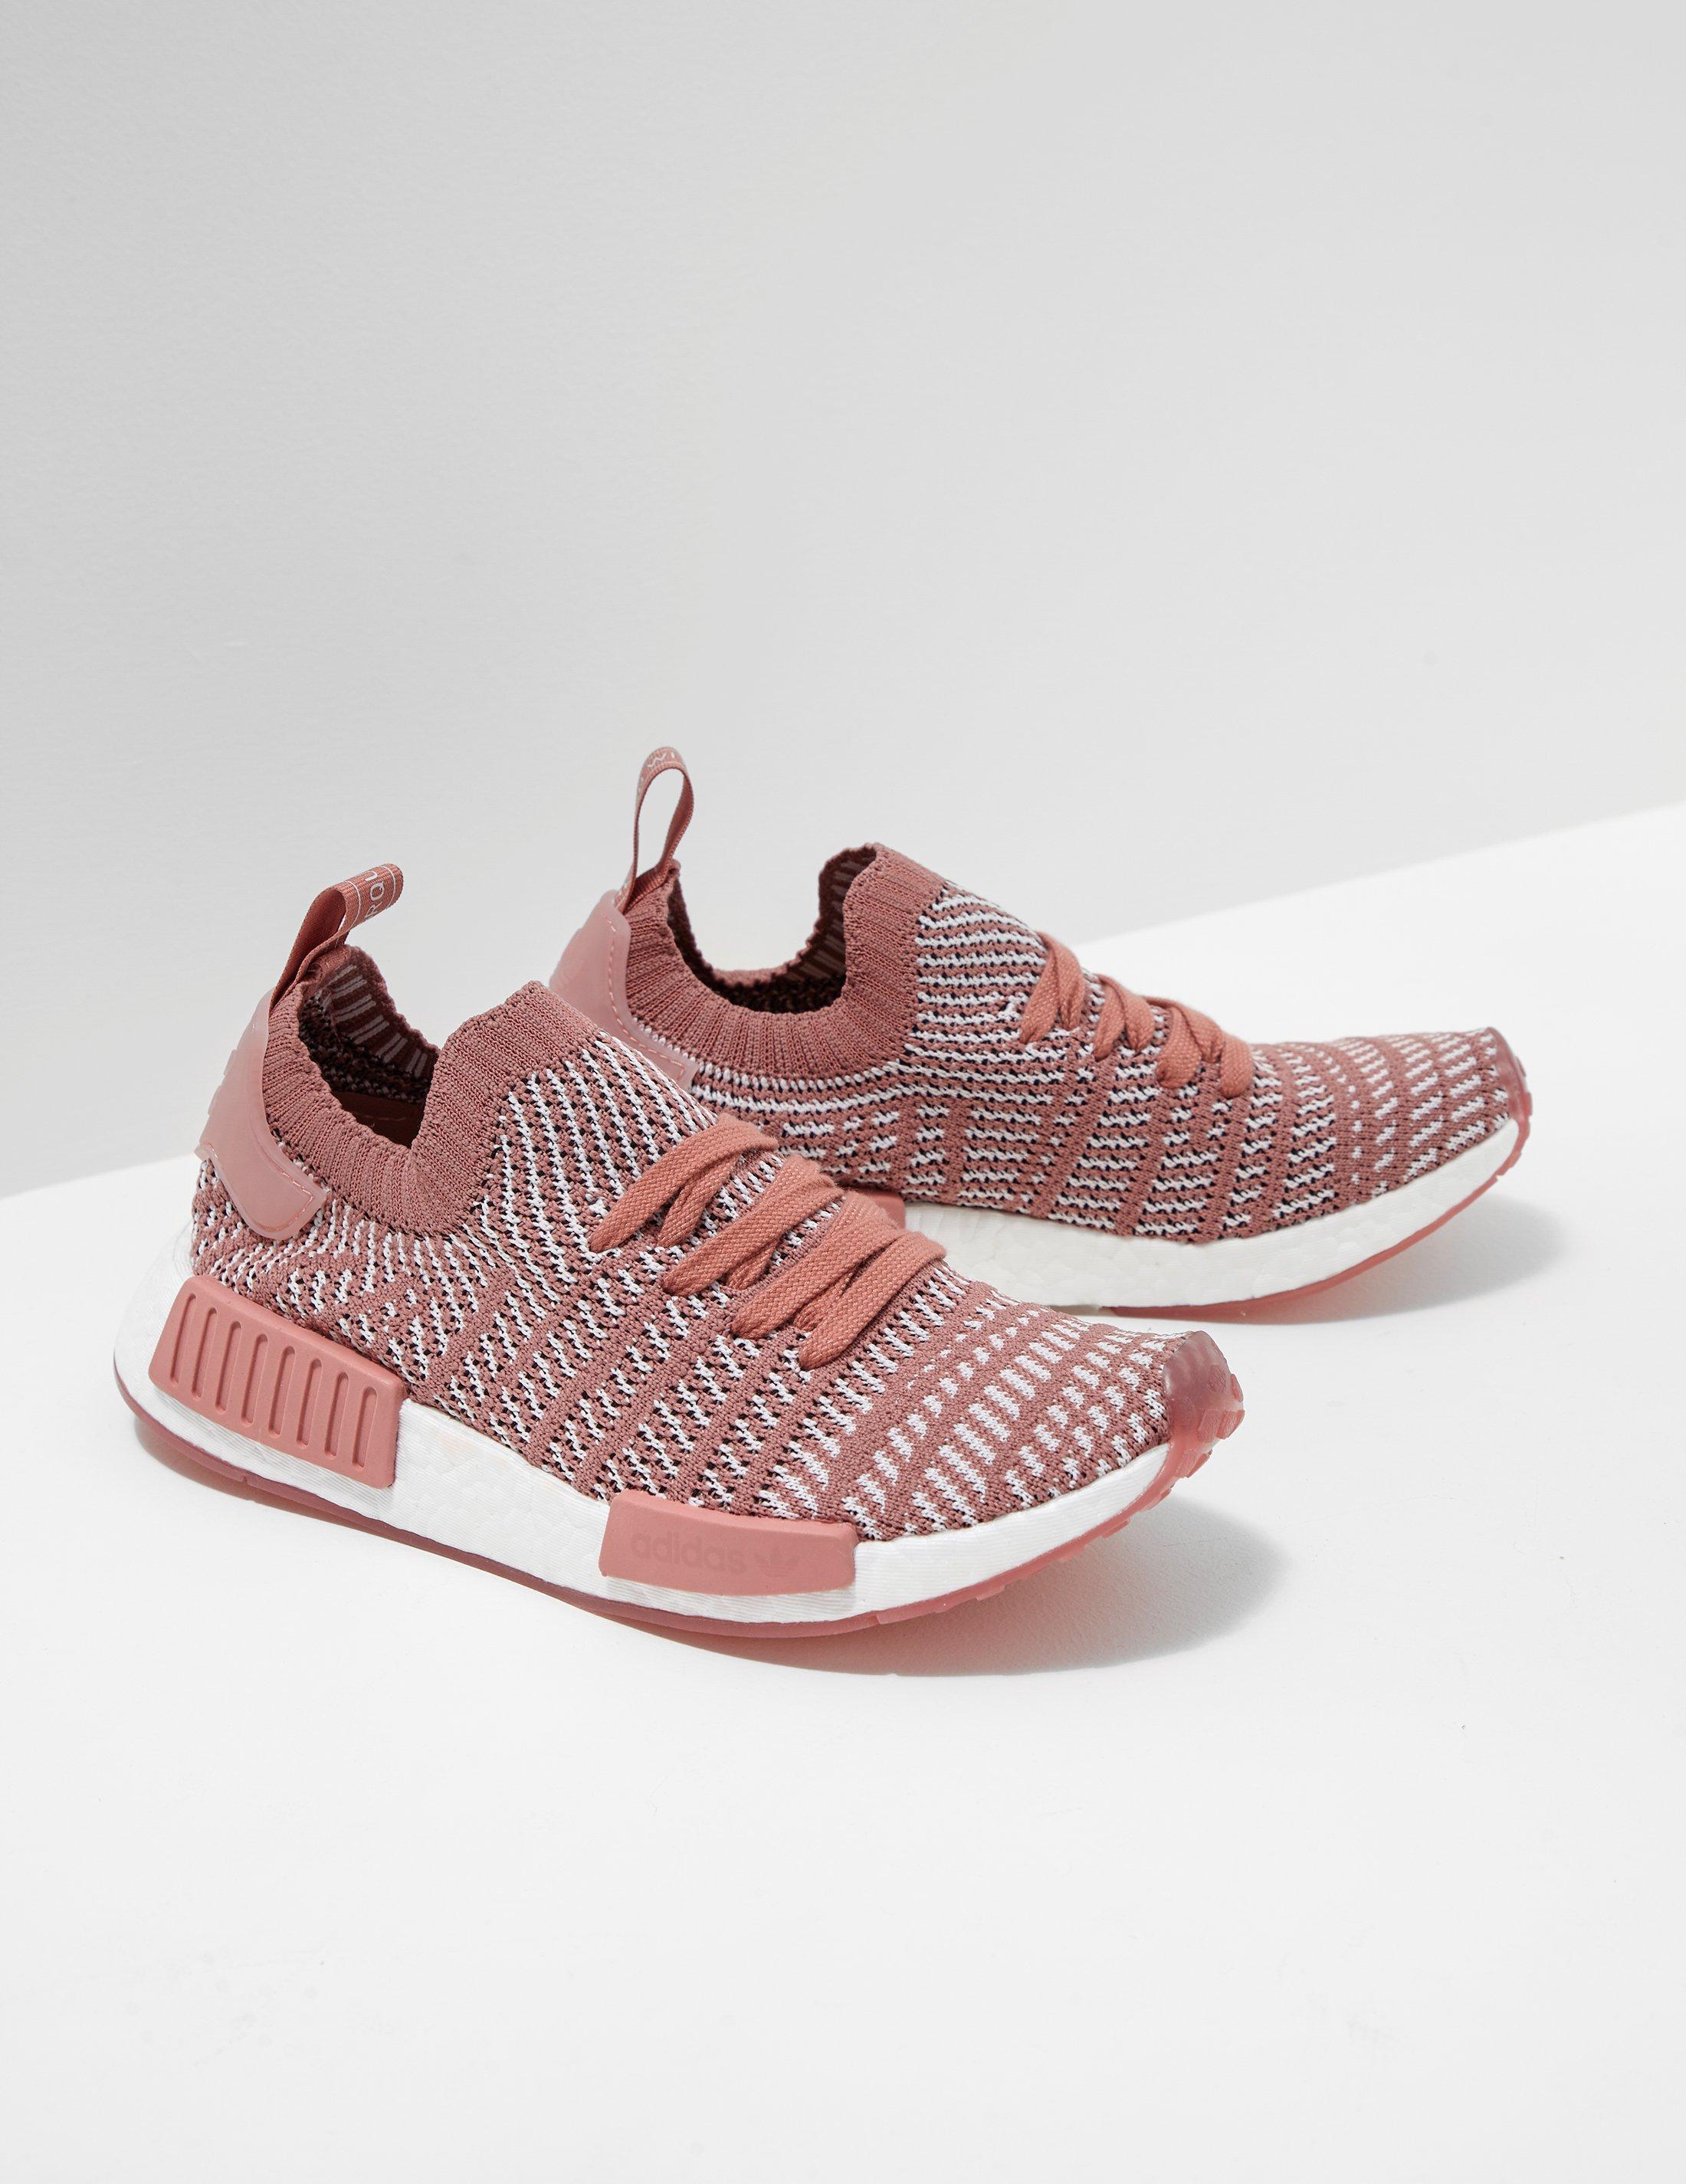 Lyst Adidas Originals Nmd R1 Stlt Pk Running Shoe In Pink Save